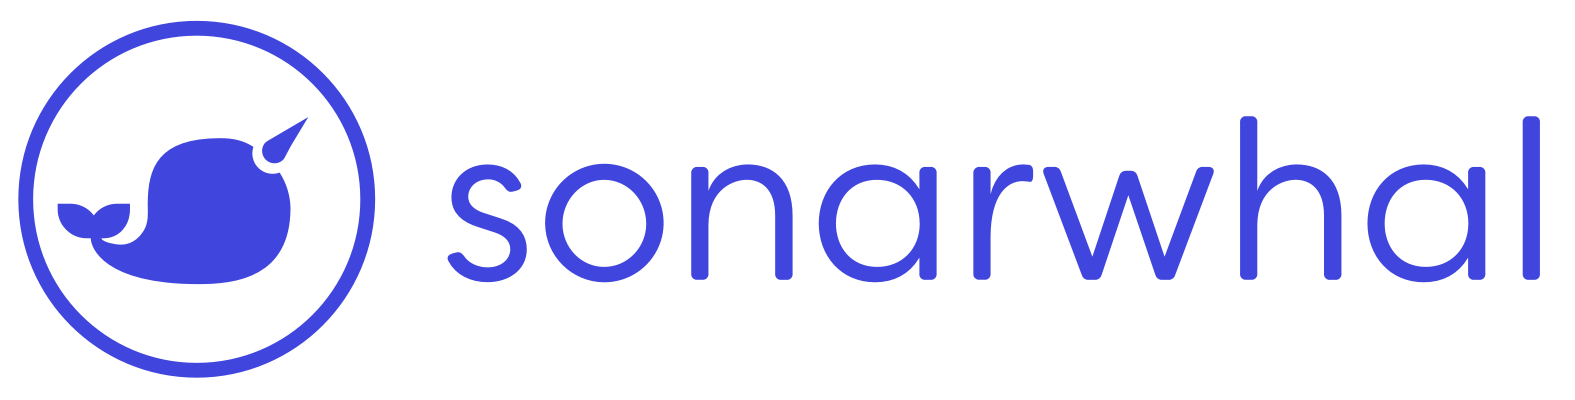 sonarwhal logo